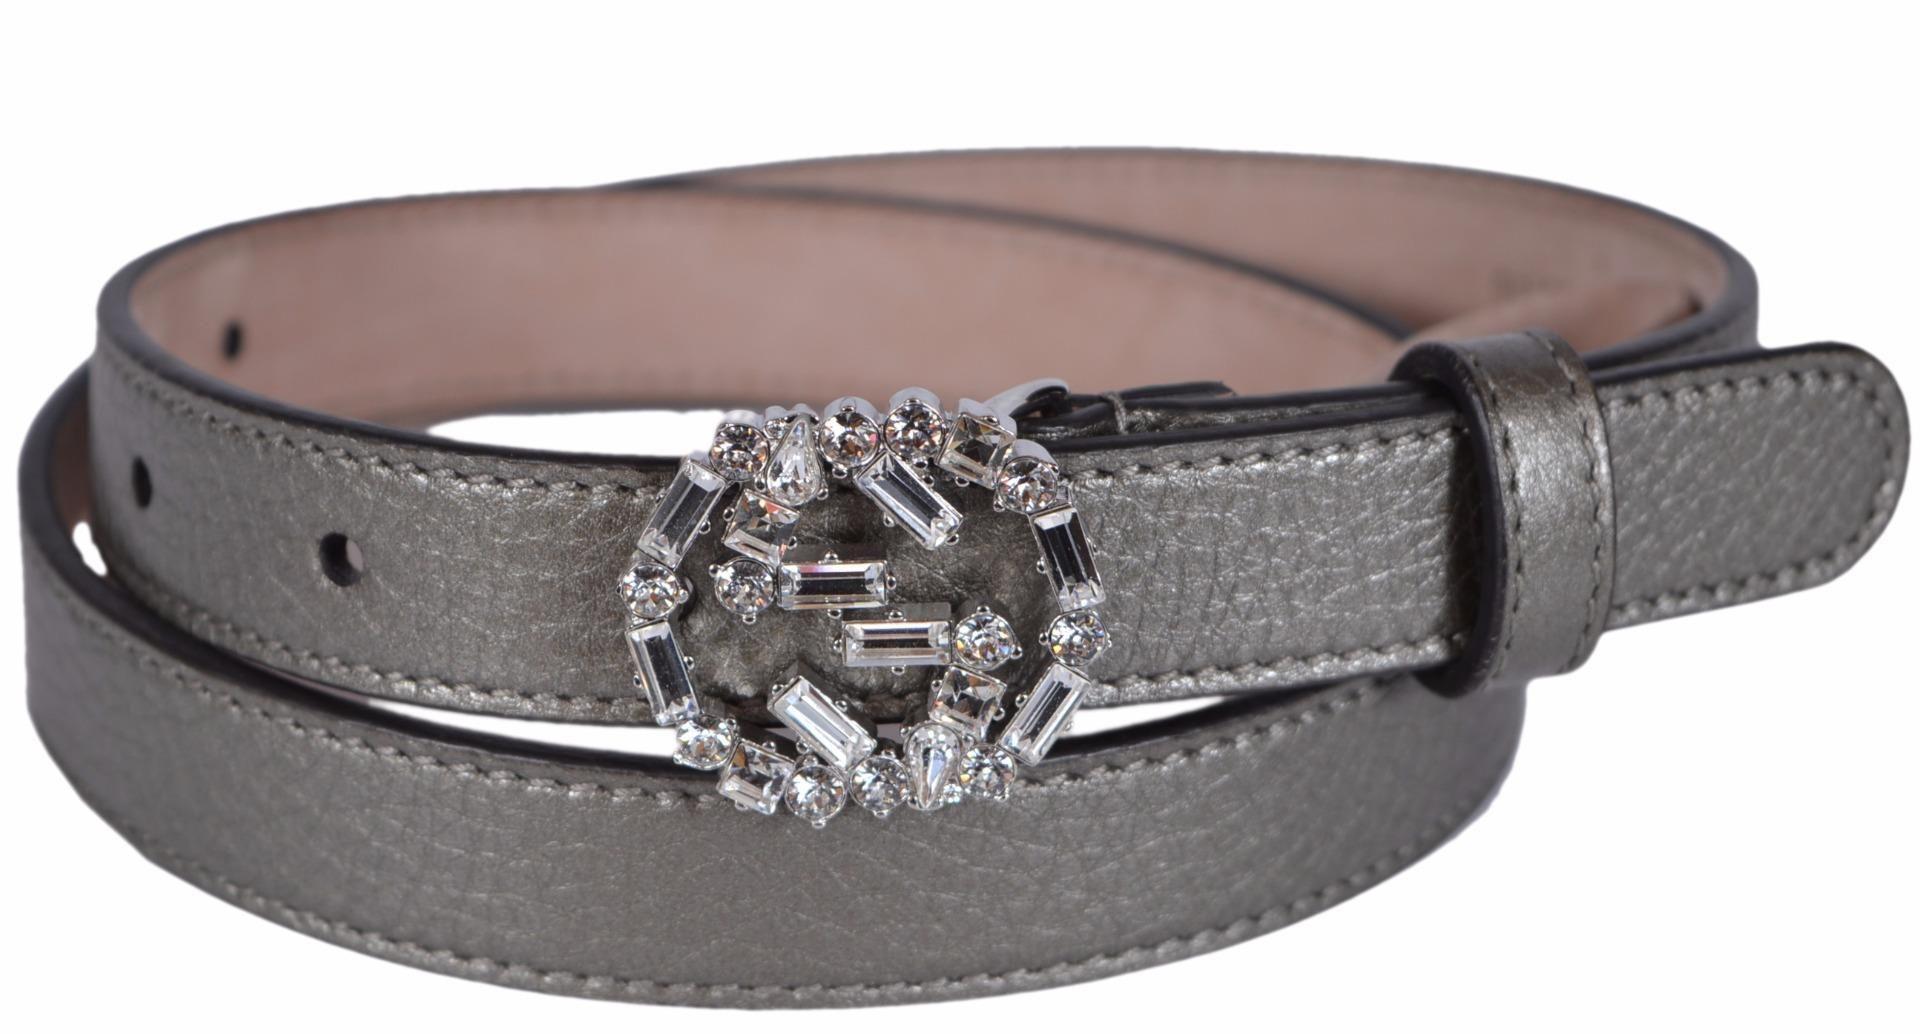 9b760878e17 New Gucci Women s Metallic Grey Leather Swarovski Crystal Belt 105 42. Free  shipping and guaranteed authenticity on New Gucci Women s Metallic Grey  Leather ...